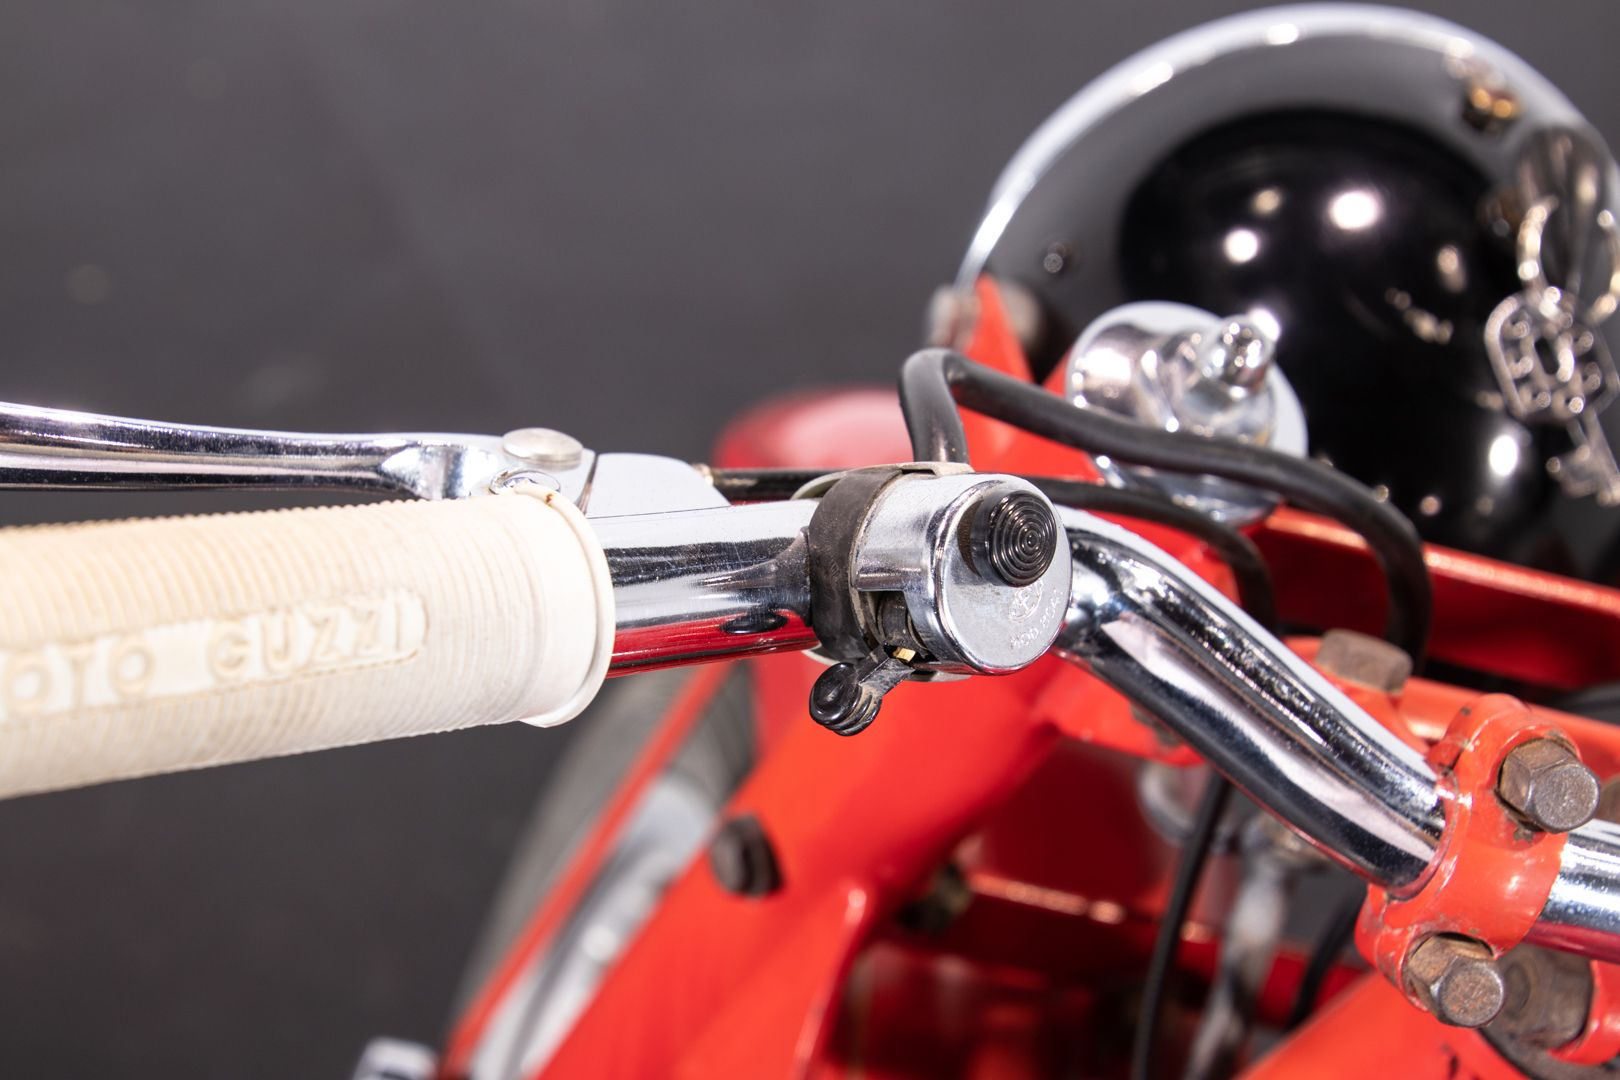 1954 Moto Guzzi Airone Sport 250 39119